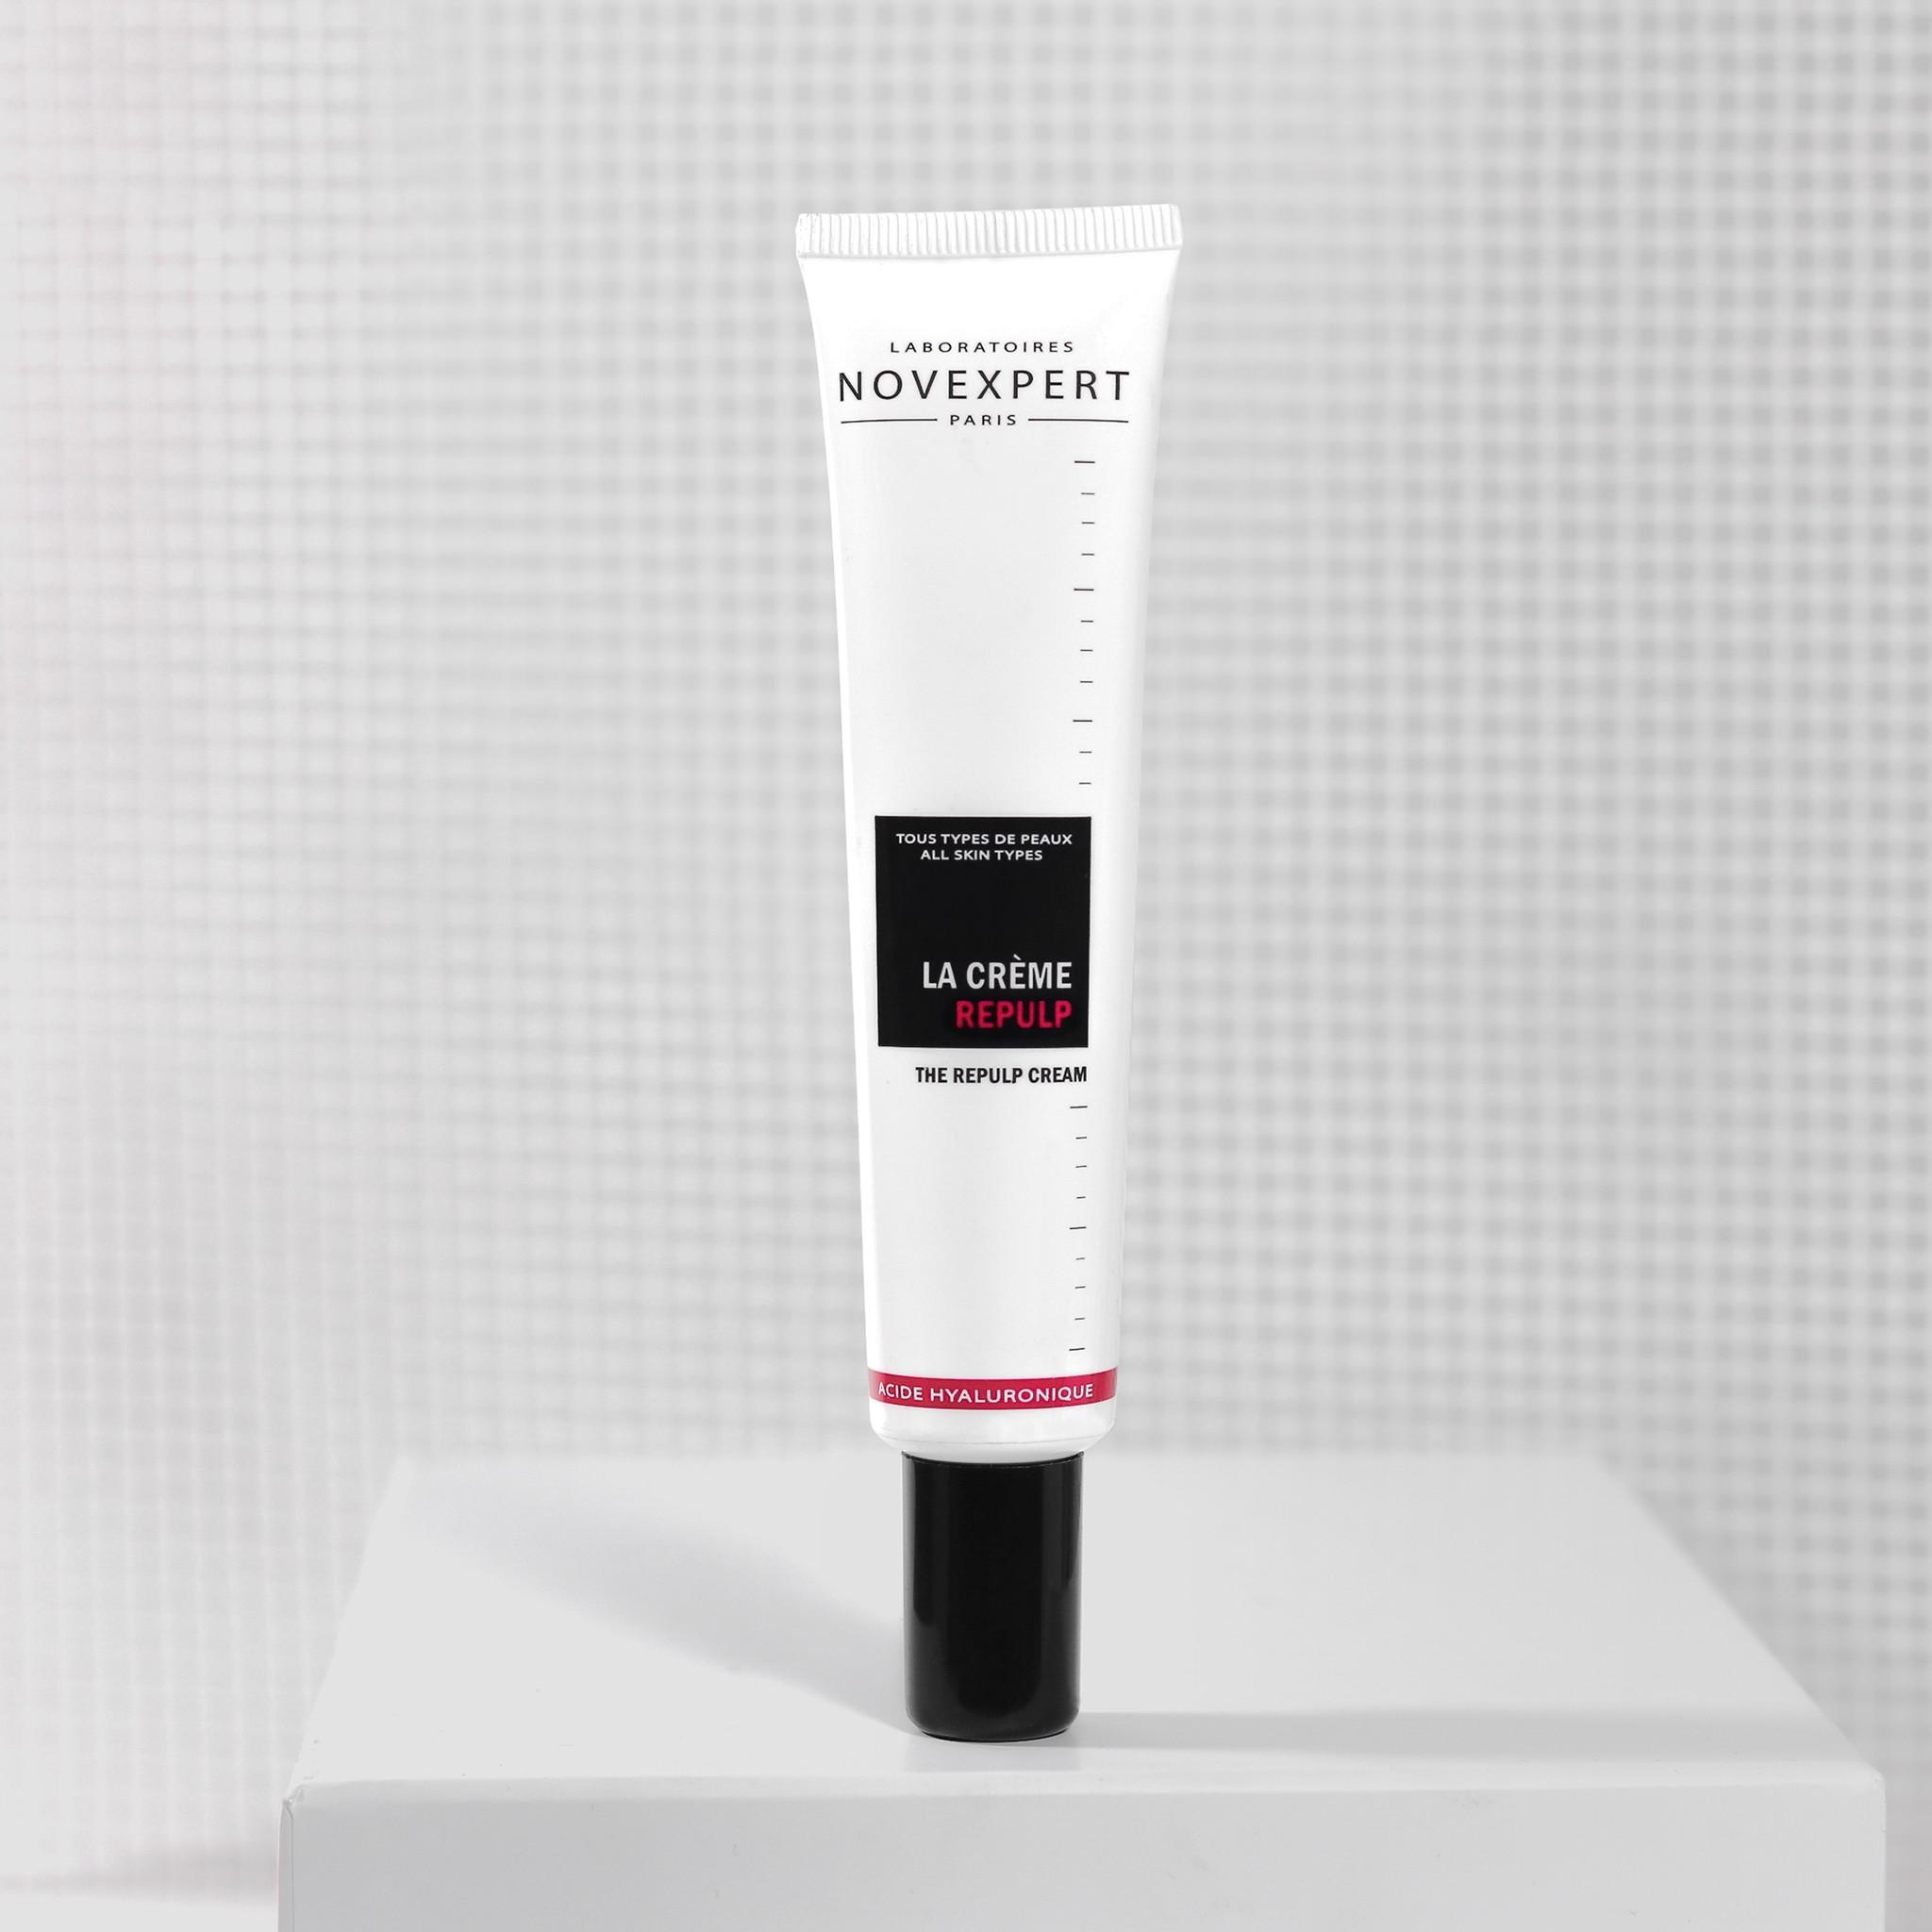 [MPLUS] NOVEXPERT Dr. Colletta the Repulp Cream 40ml